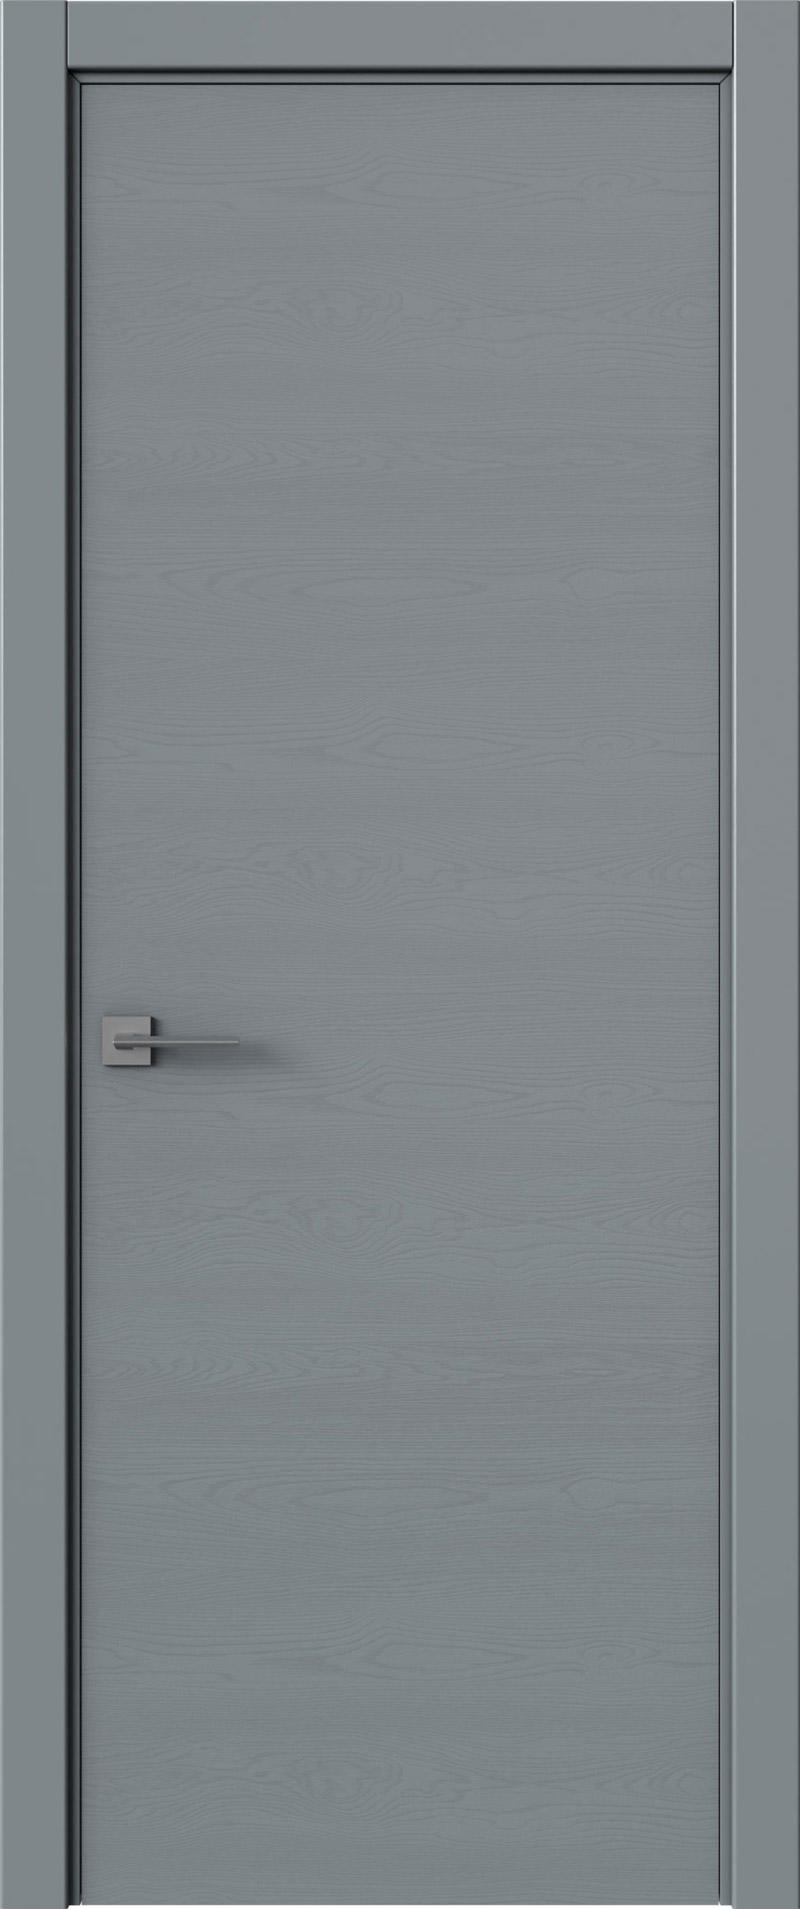 Tivoli А-2 цвет - Серебристо-серая эмаль по шпону (RAL 7045) Без стекла (ДГ)